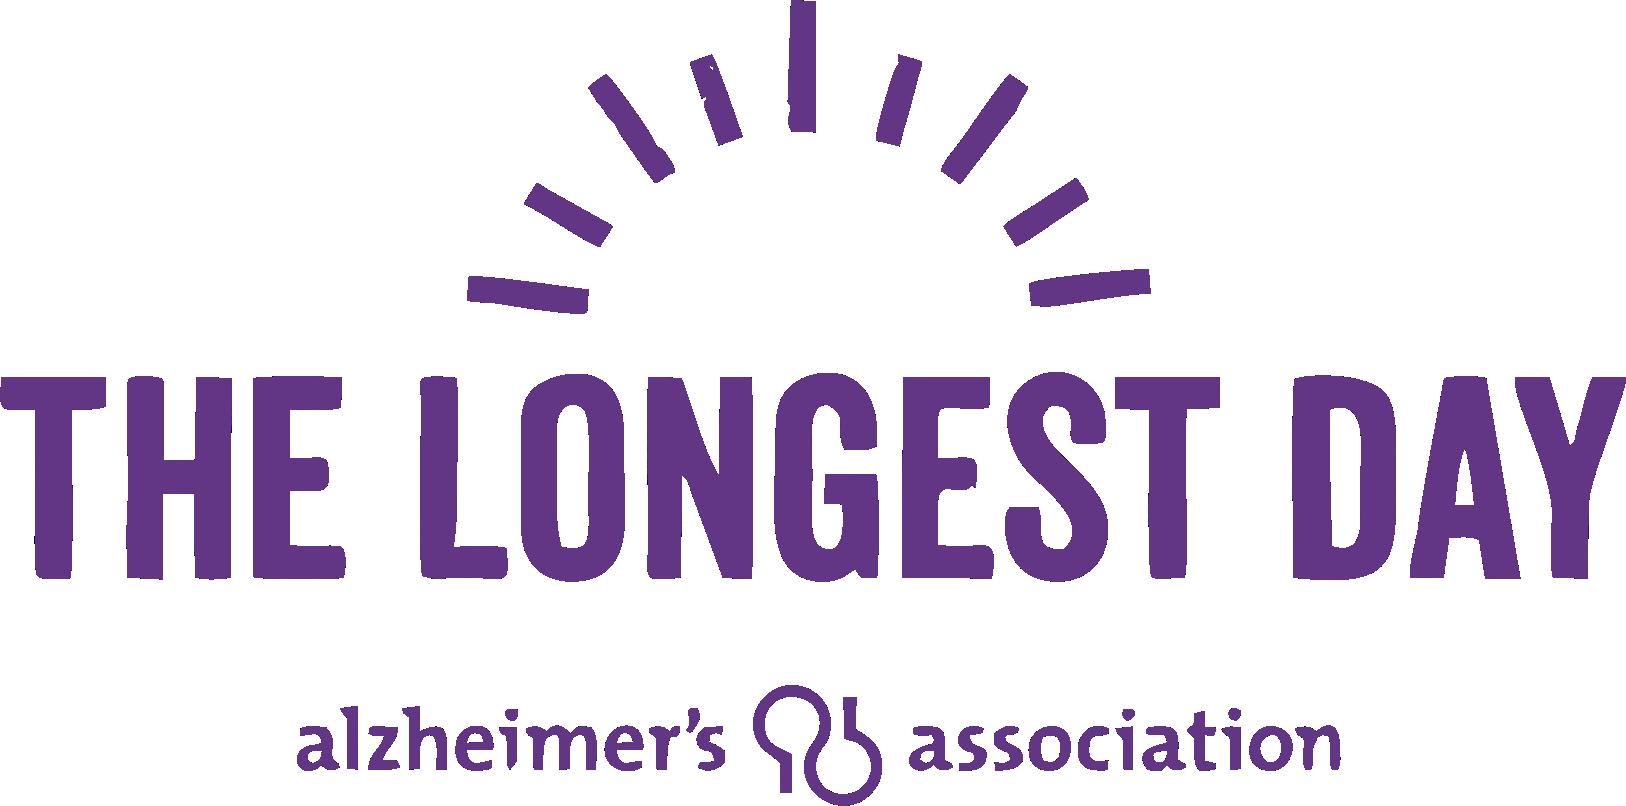 Alzheimers Association - The Longest Day Logo